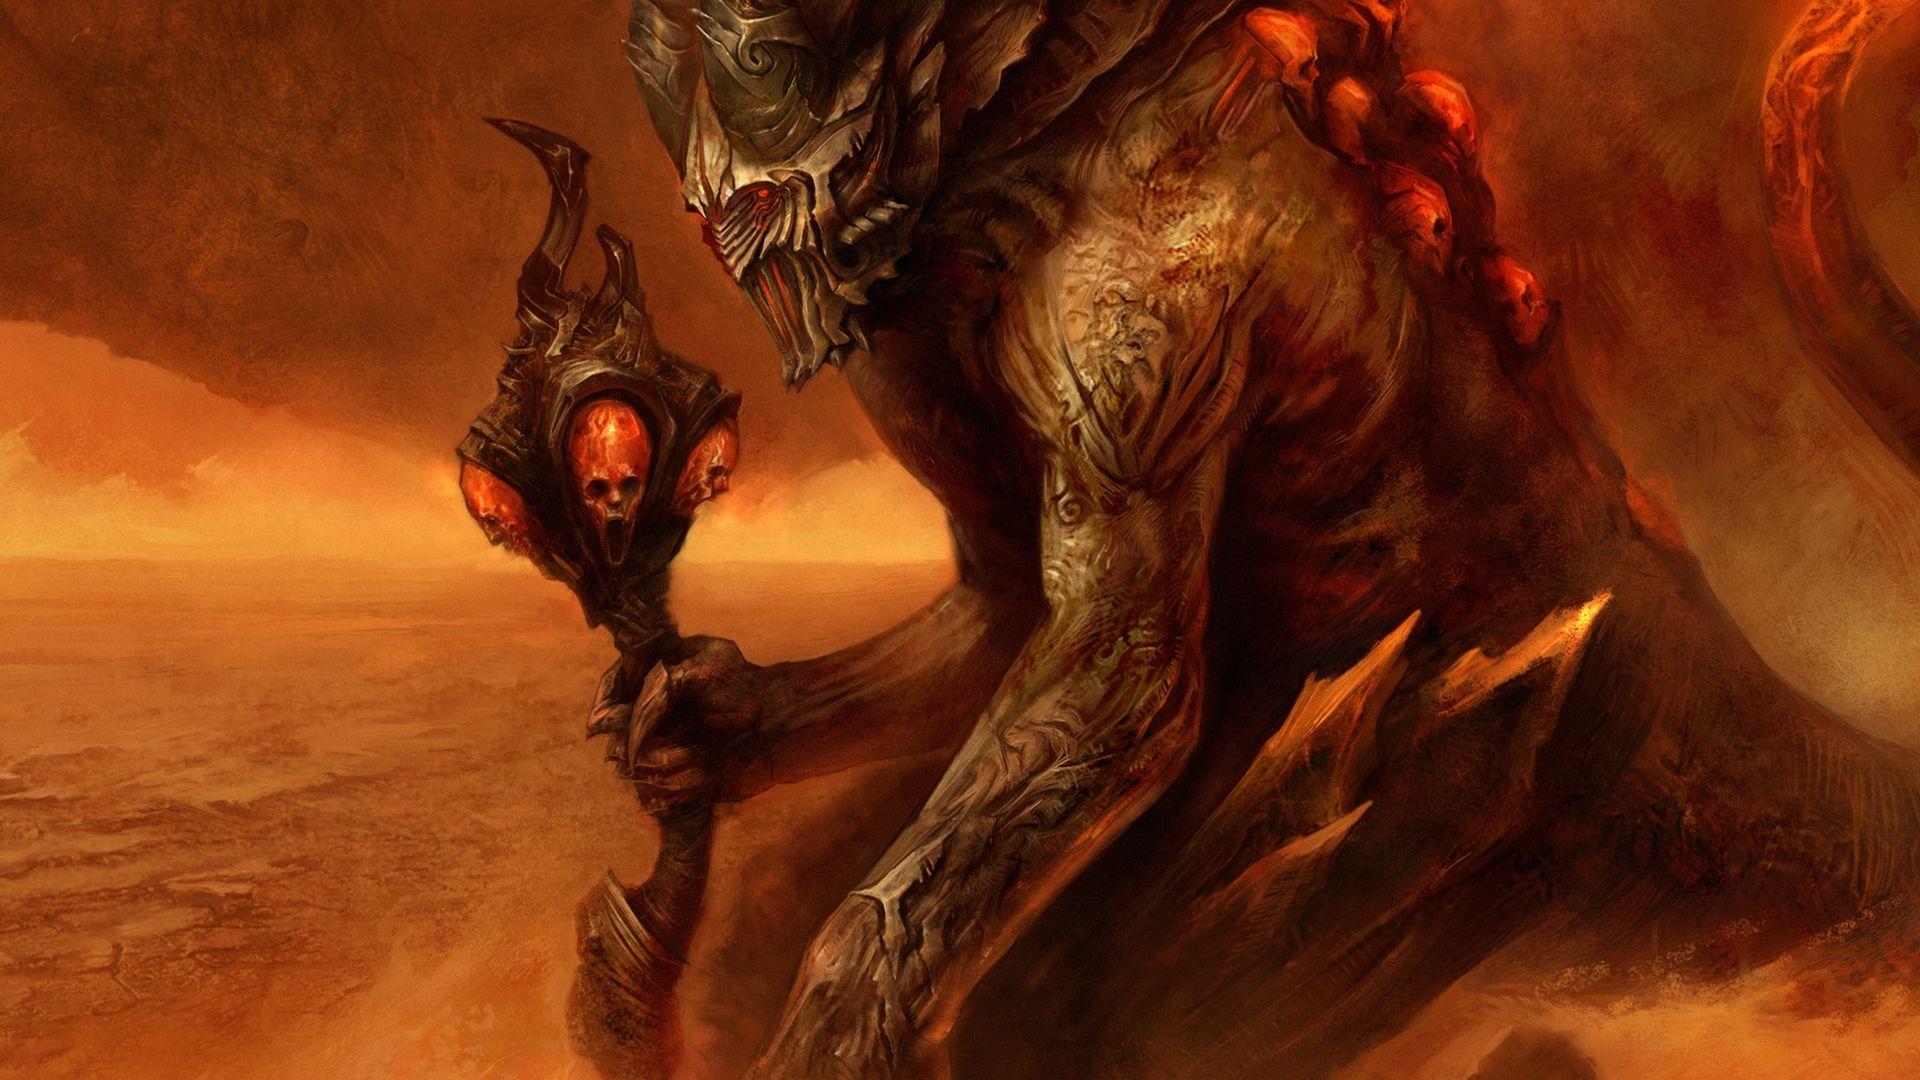 Hell Wallpaper hd Hell Beast x Wallpapers 1920x1080